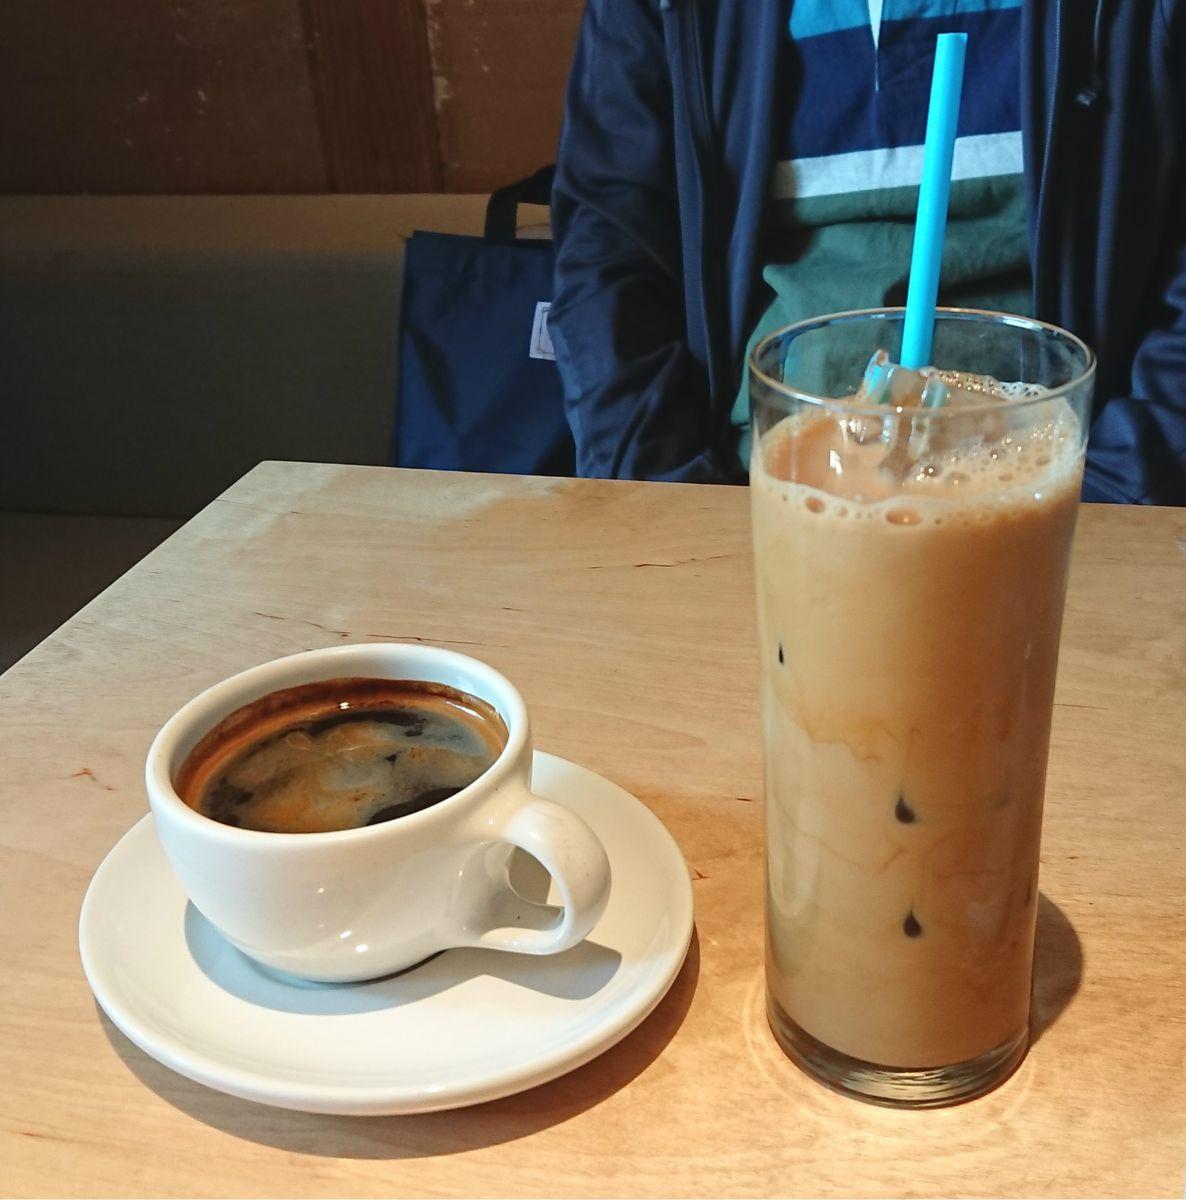 f:id:mainichi-caffe:20191110222544j:plain